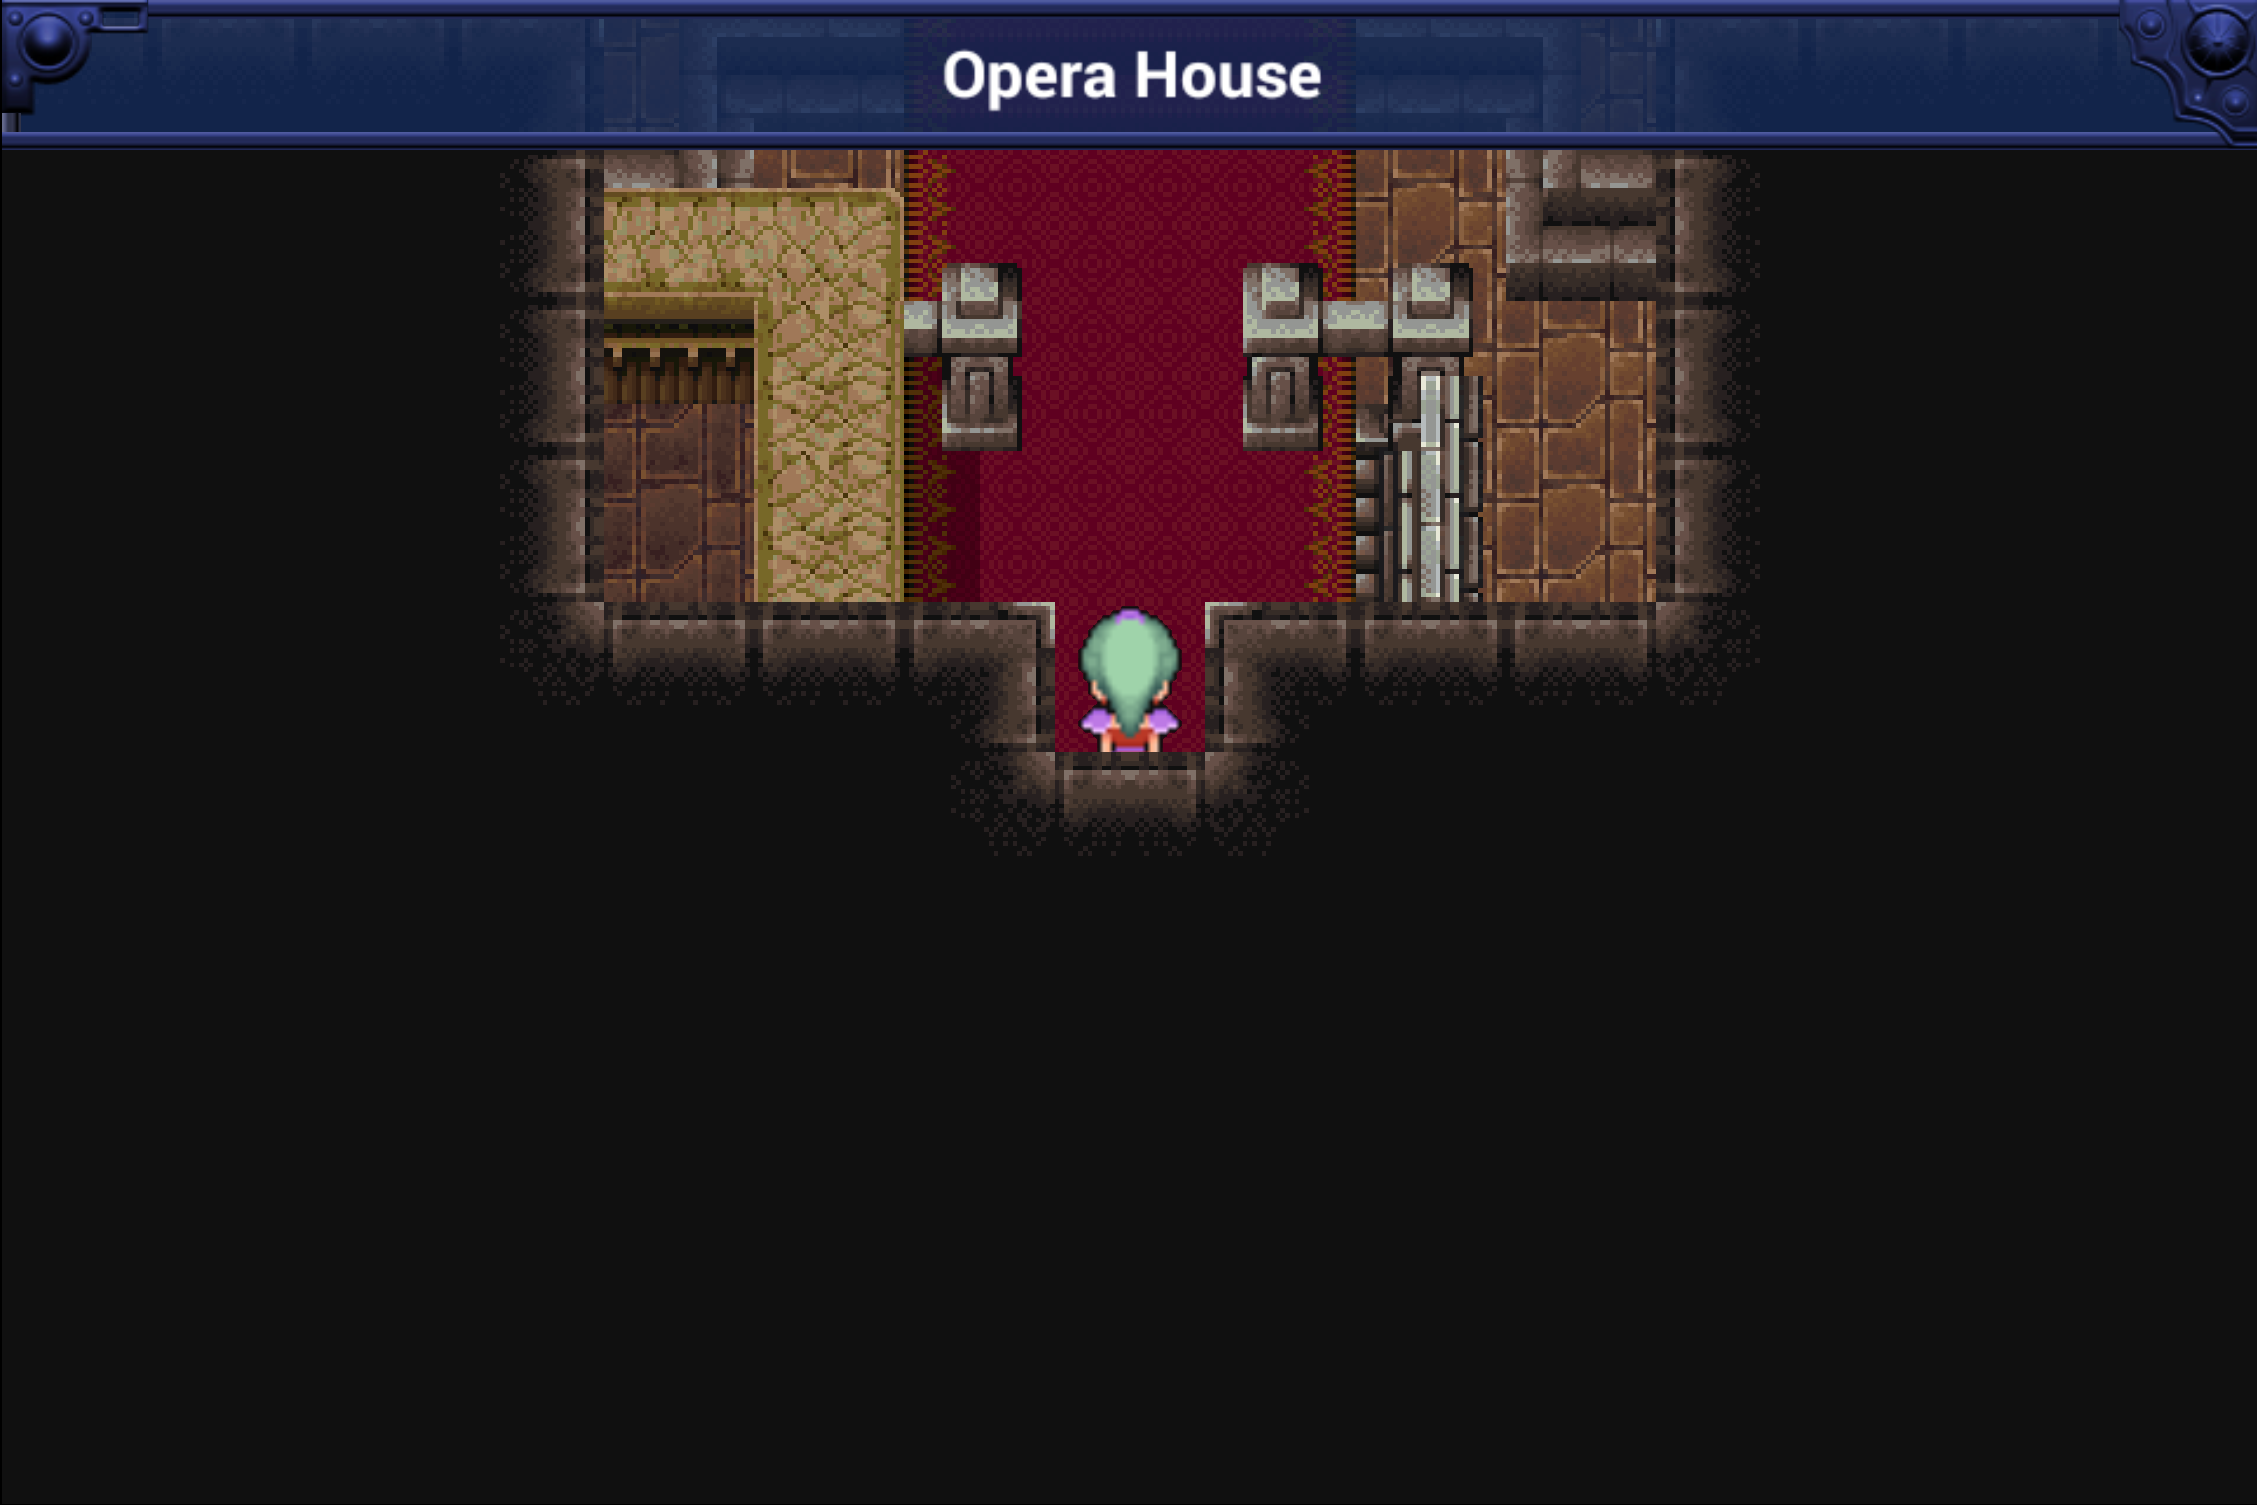 FFVI Opera House entrance iOS.png